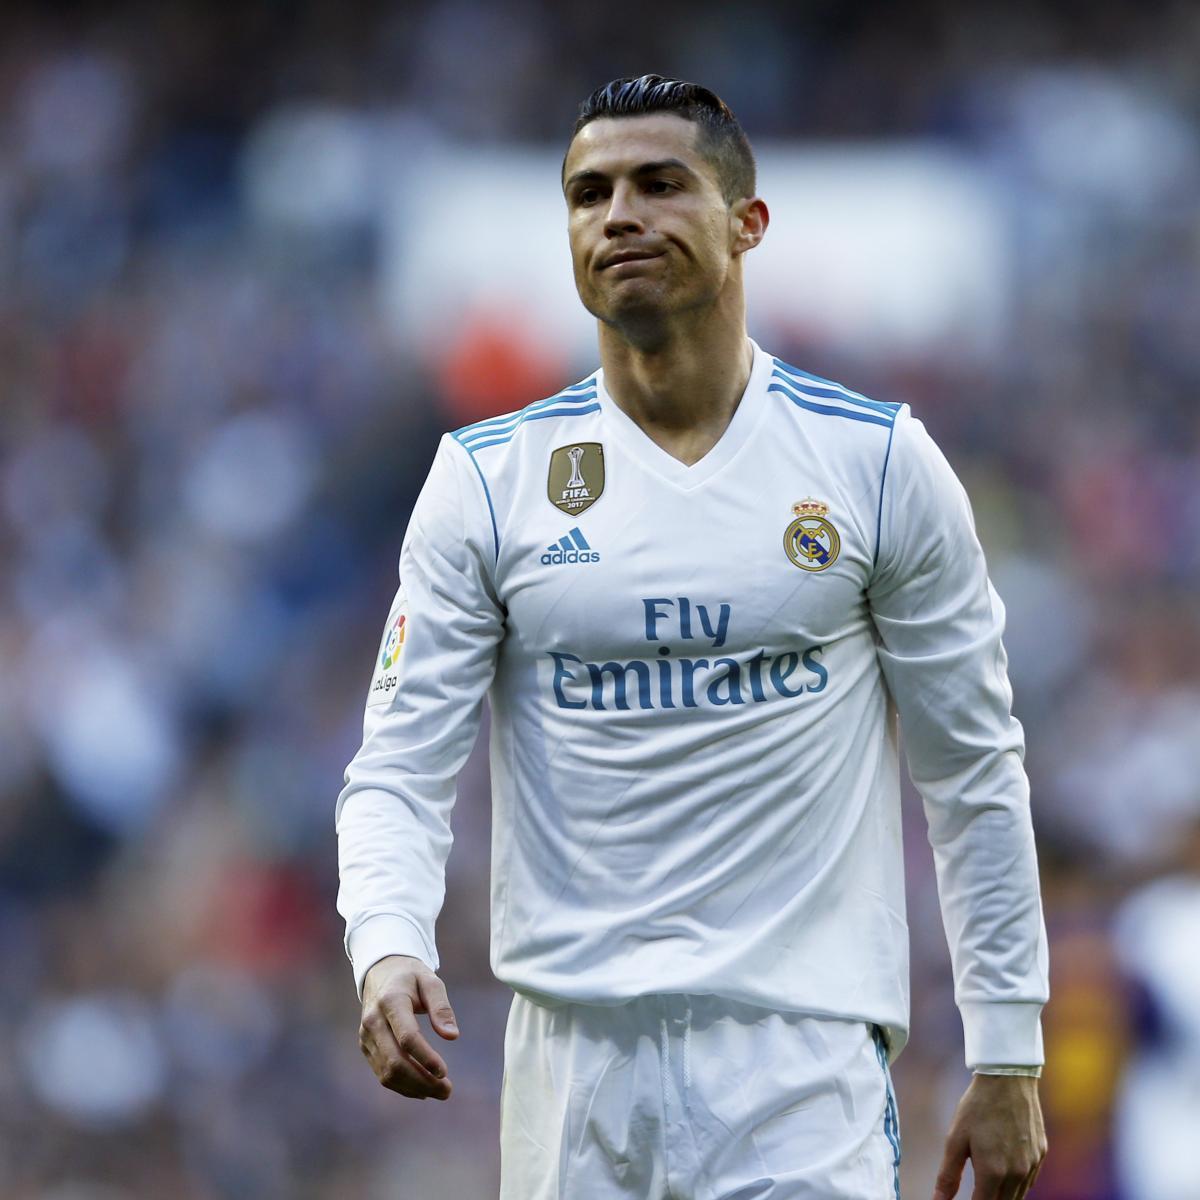 Real Madrid vs. Villarreal: Team News, Preview, Live Stream, TV Info